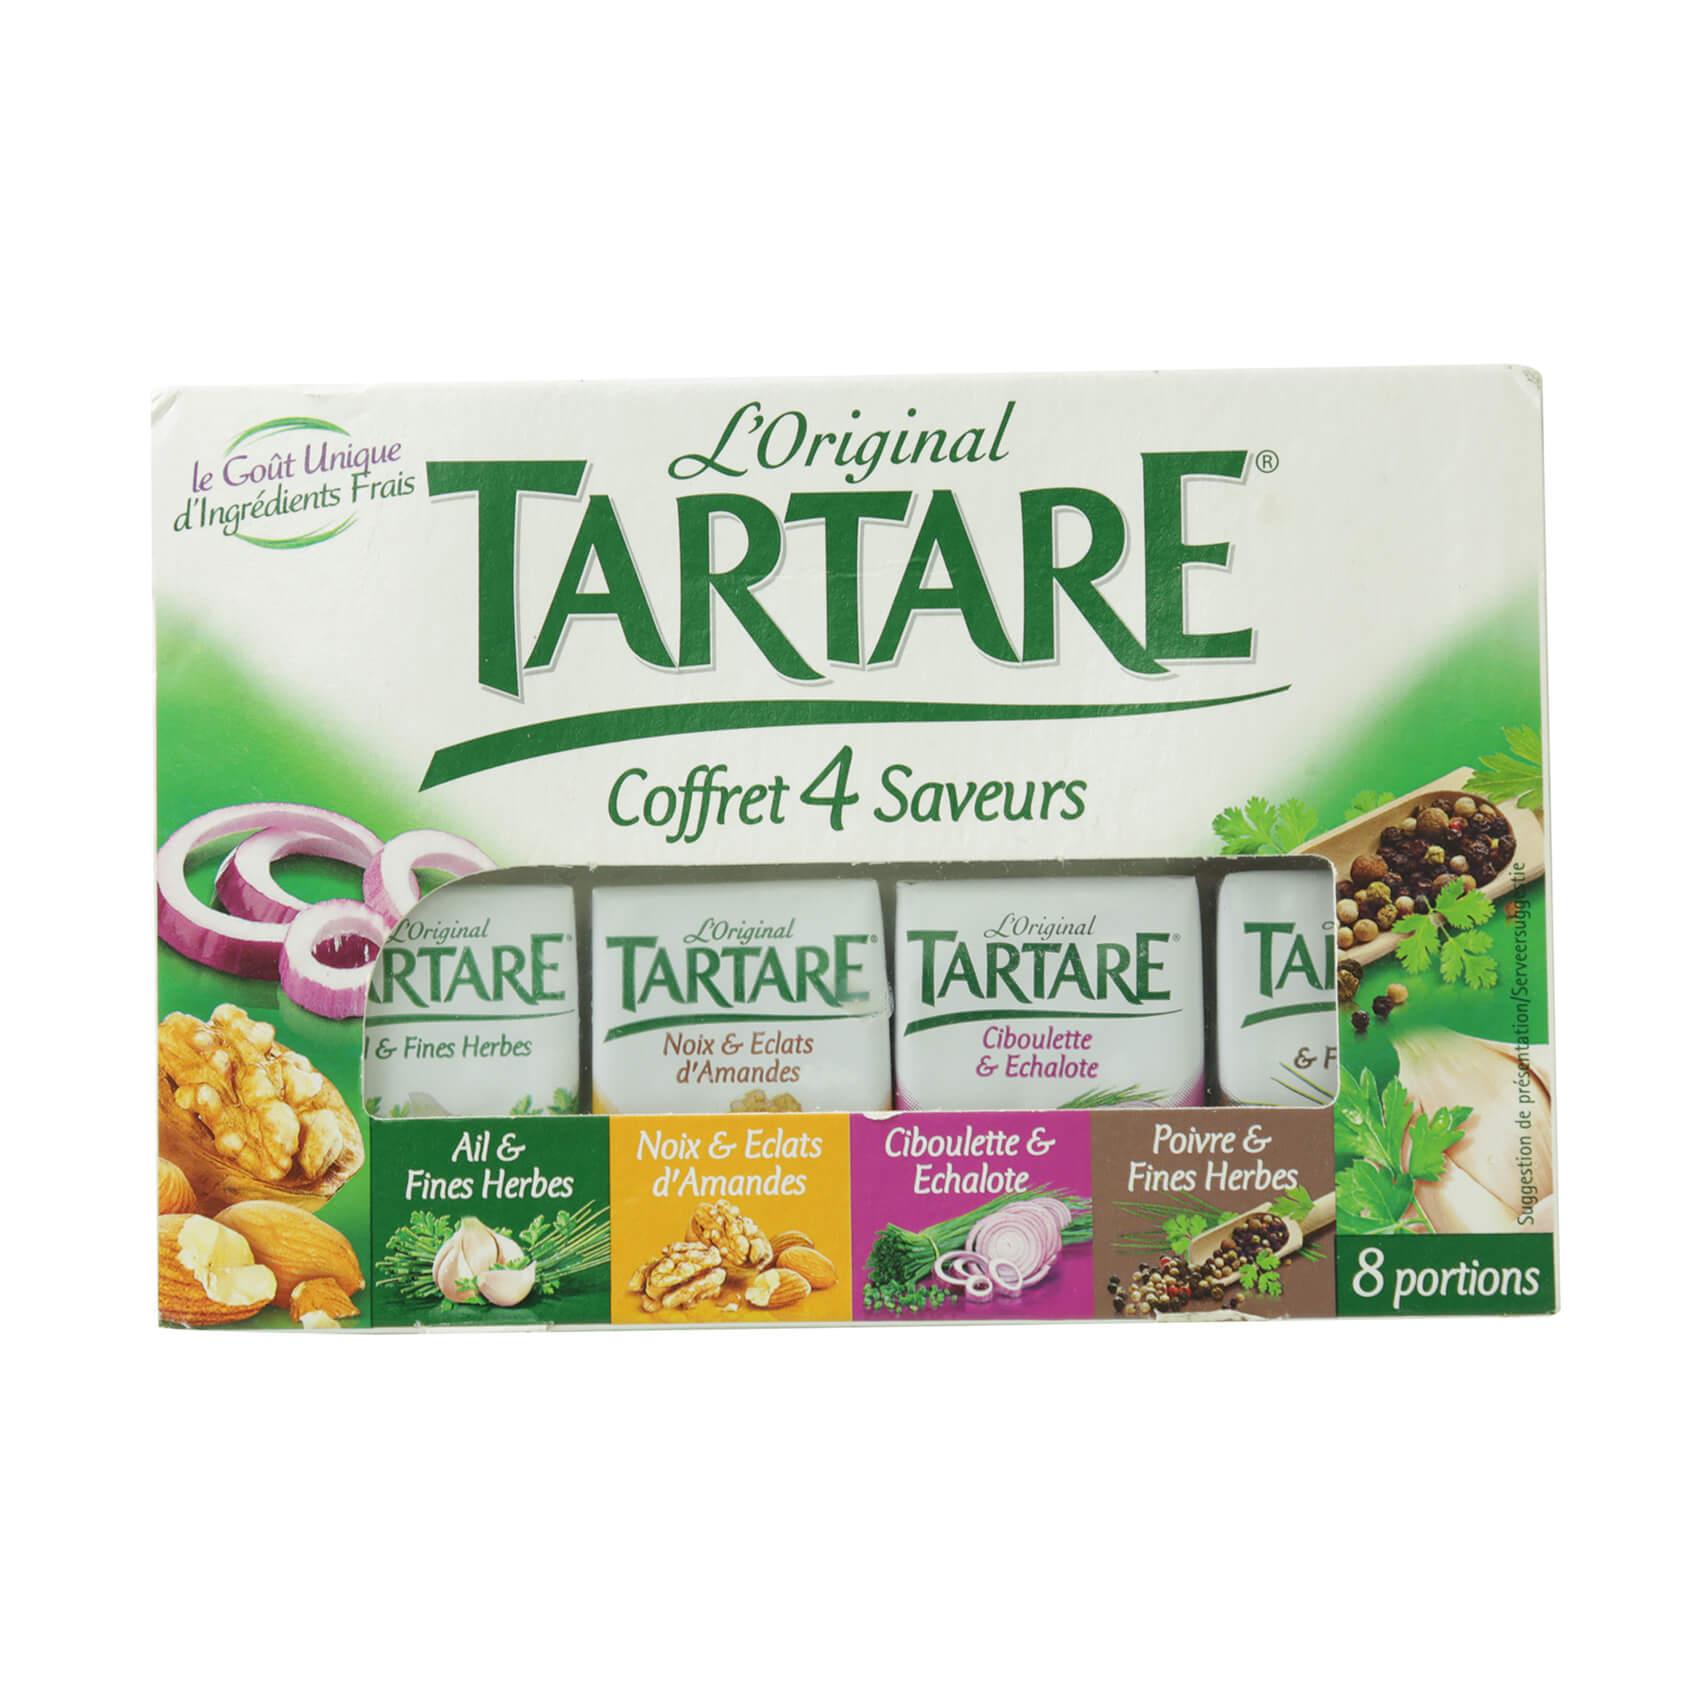 TARTARE COFFRET 4 SAVEURS 16.63GX8